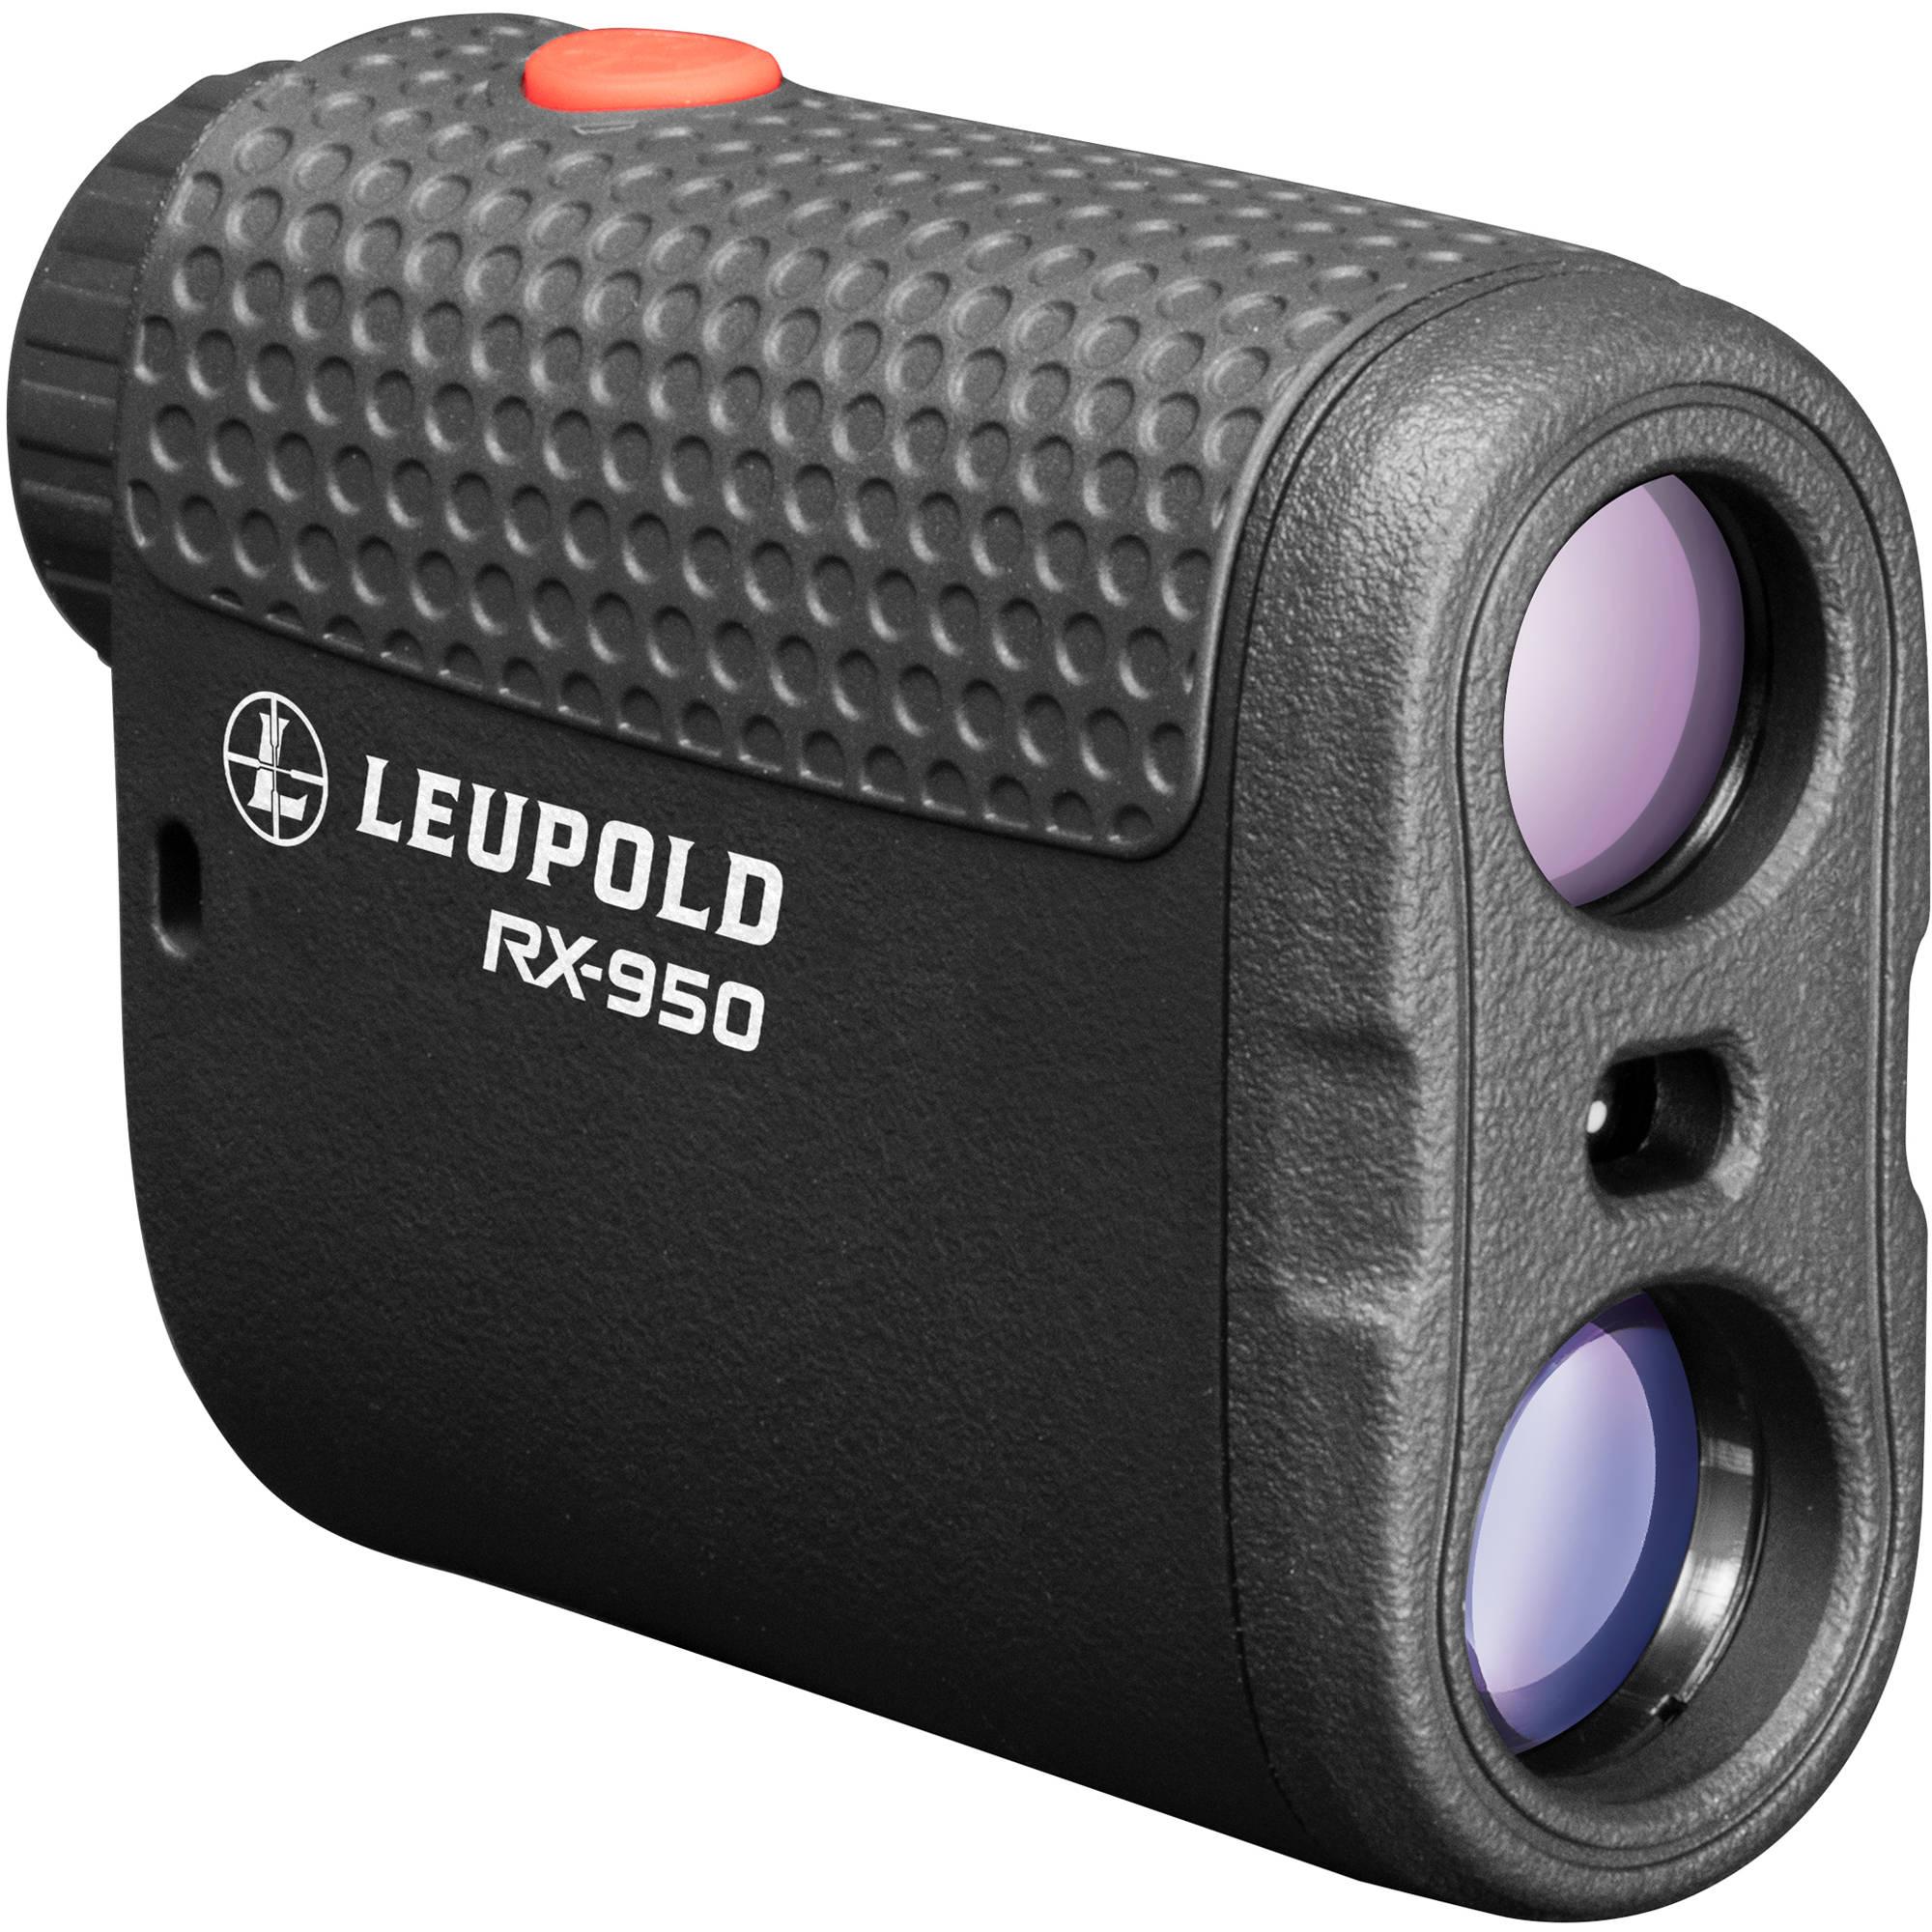 leupold_176769_rx_950_digital_laser_rangefinder_1451066